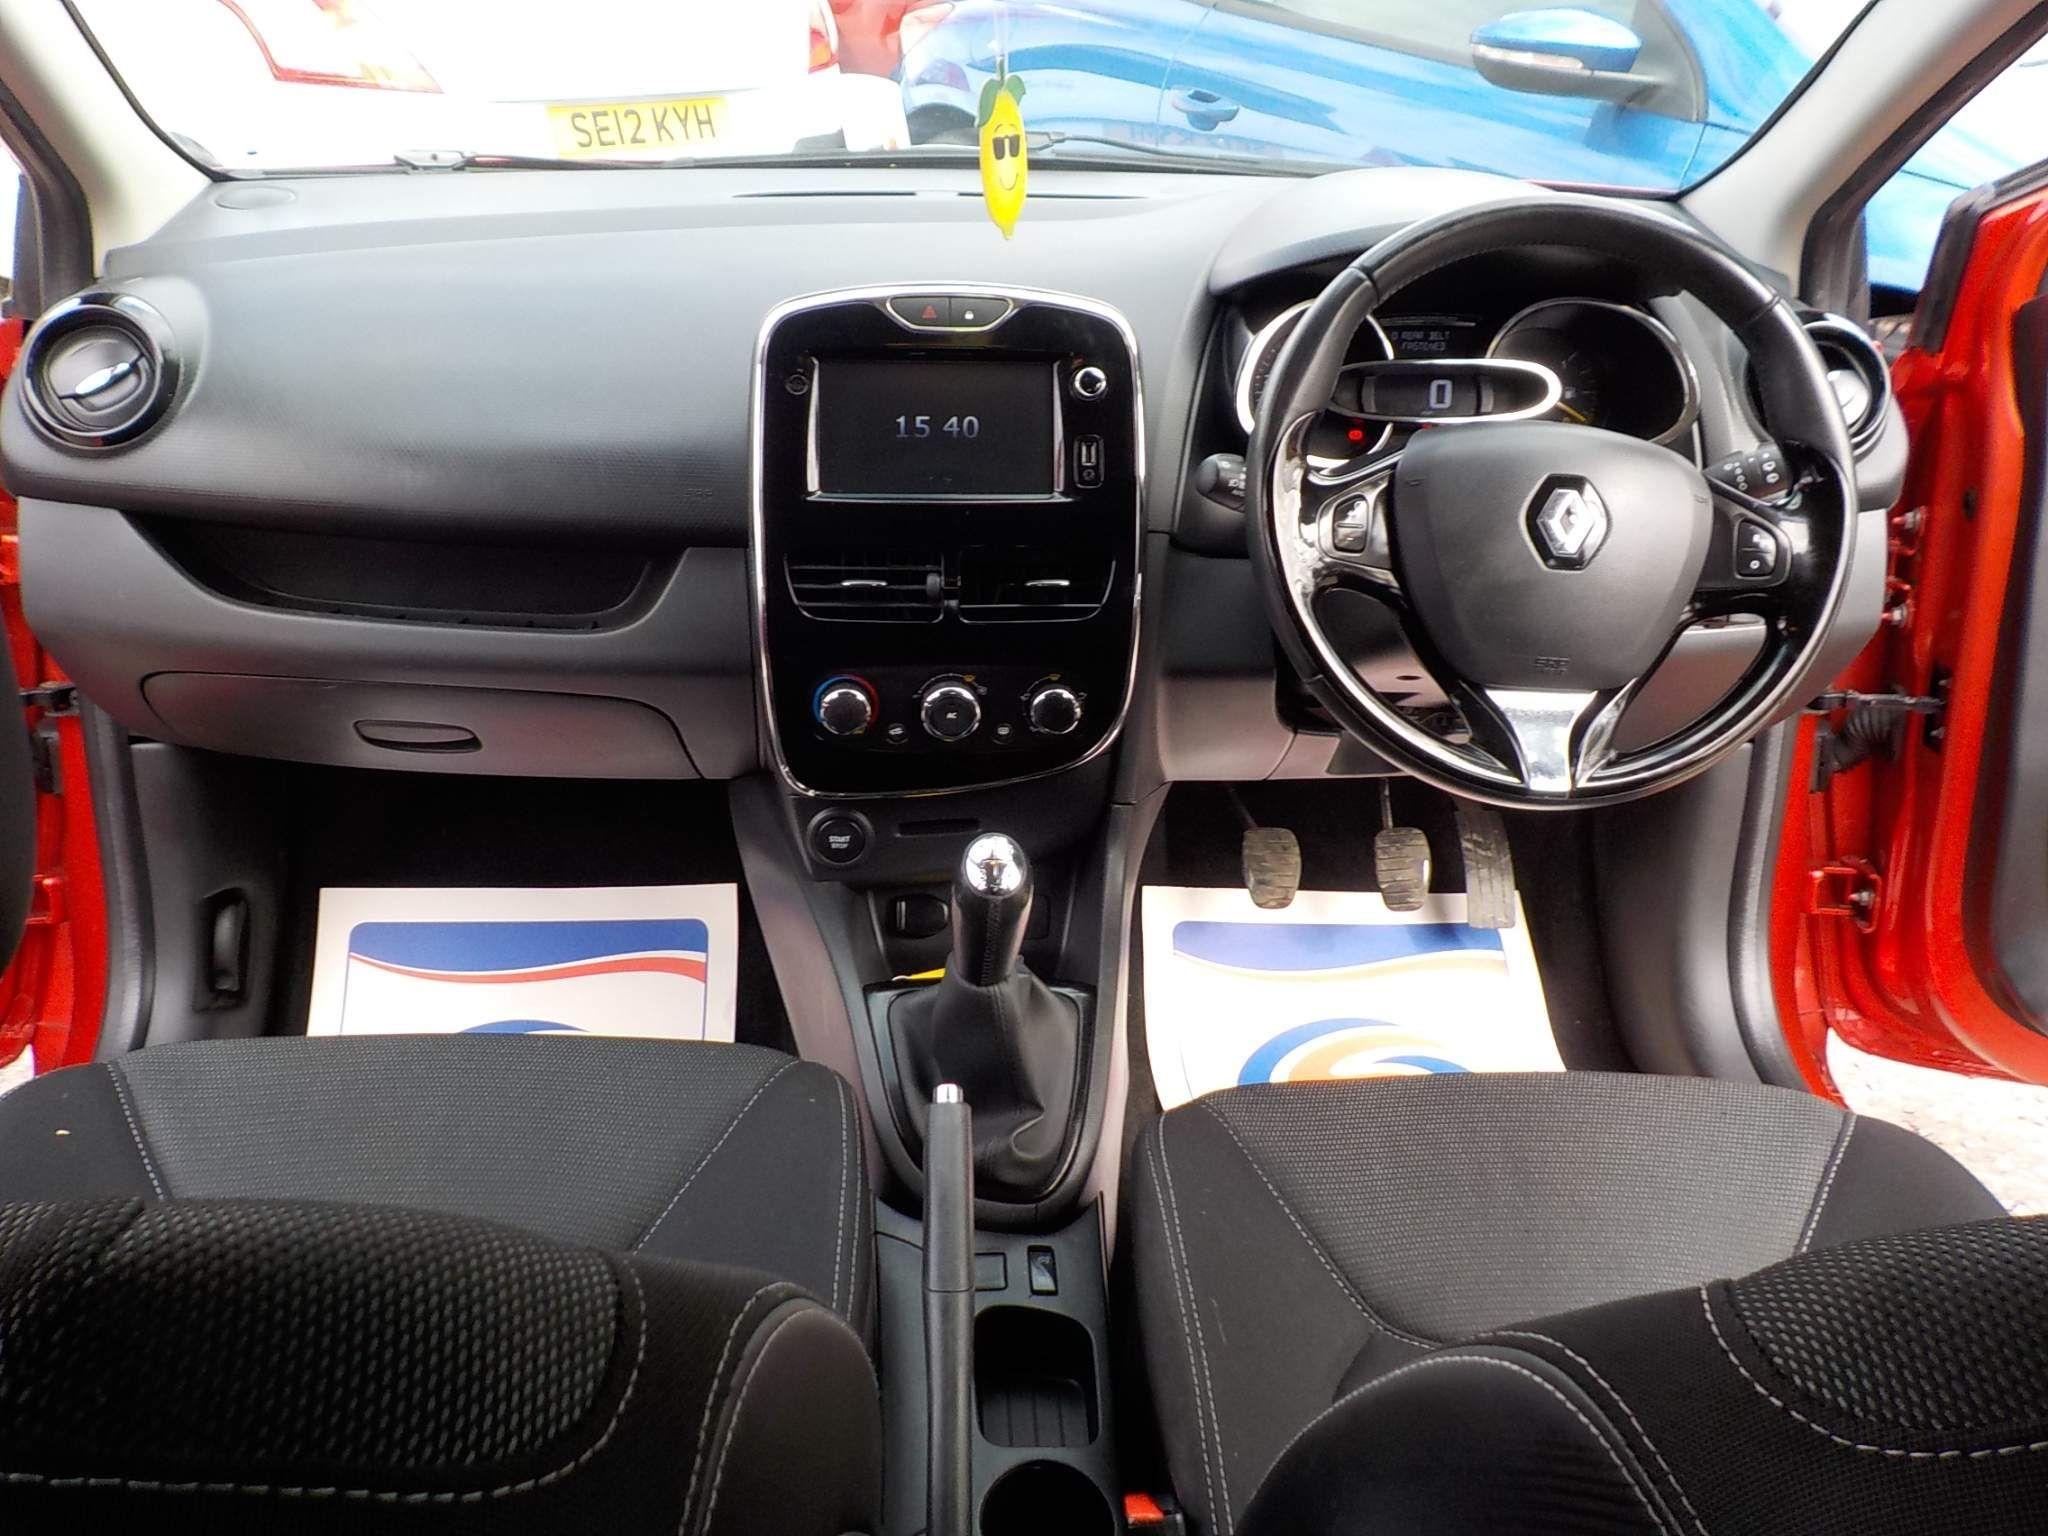 Renault Clio 1.5 dCi ENERGY Dynamique MediaNav (s/s) 5dr